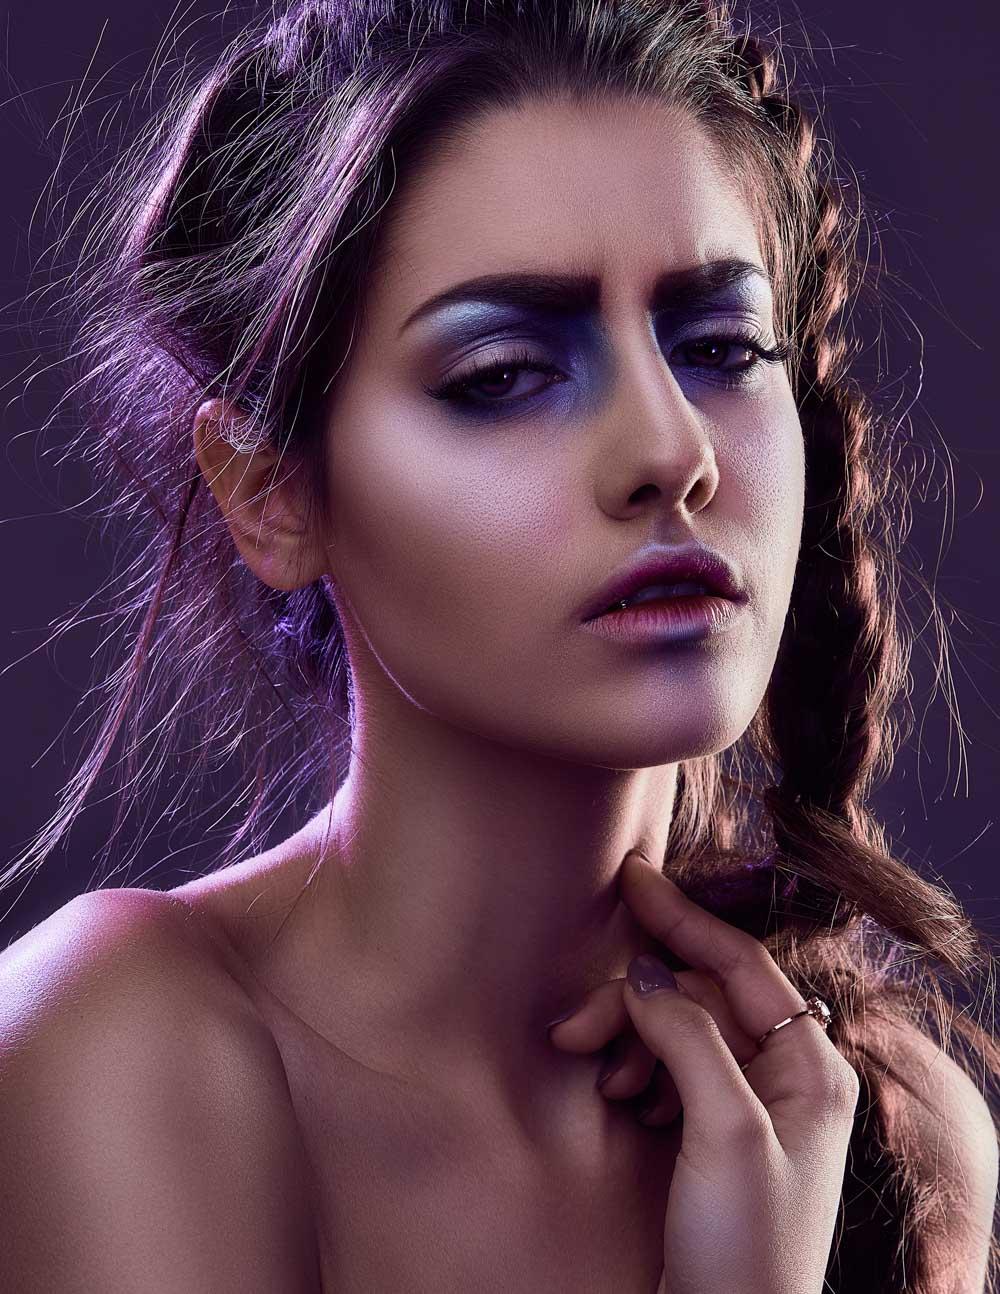 editorial-simone-haas-bianca-puchmueller-models-makeup-metallized-makeup-portrait-lizz-sator-prontolux06_spectrum_byLizzKrobath.jpg